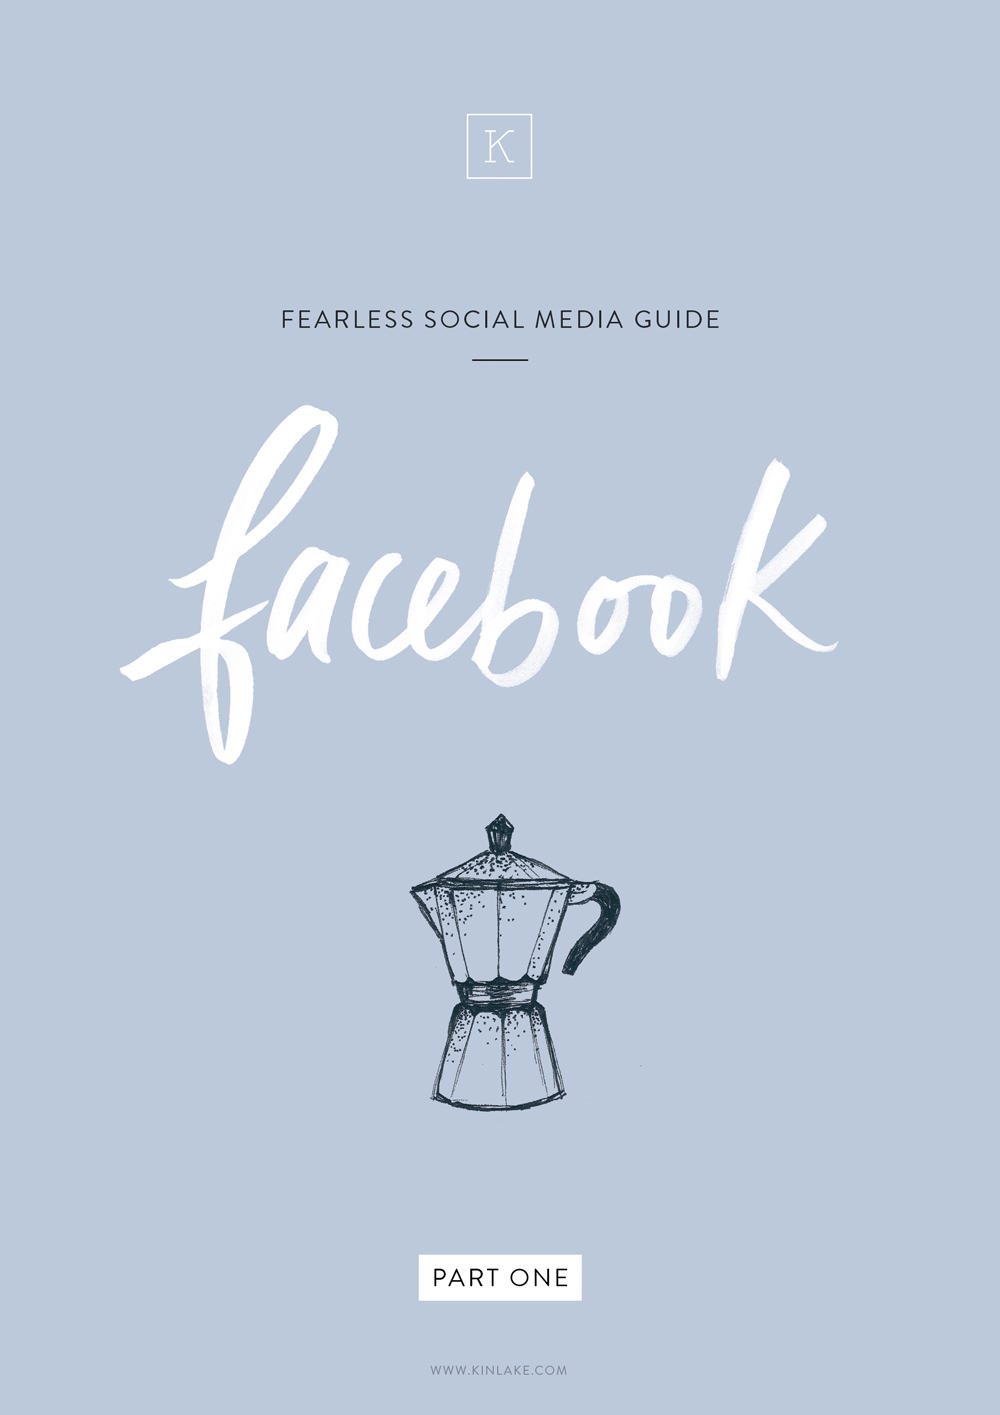 Fearless-social-media-tips-guide-facebook-kinlake-02